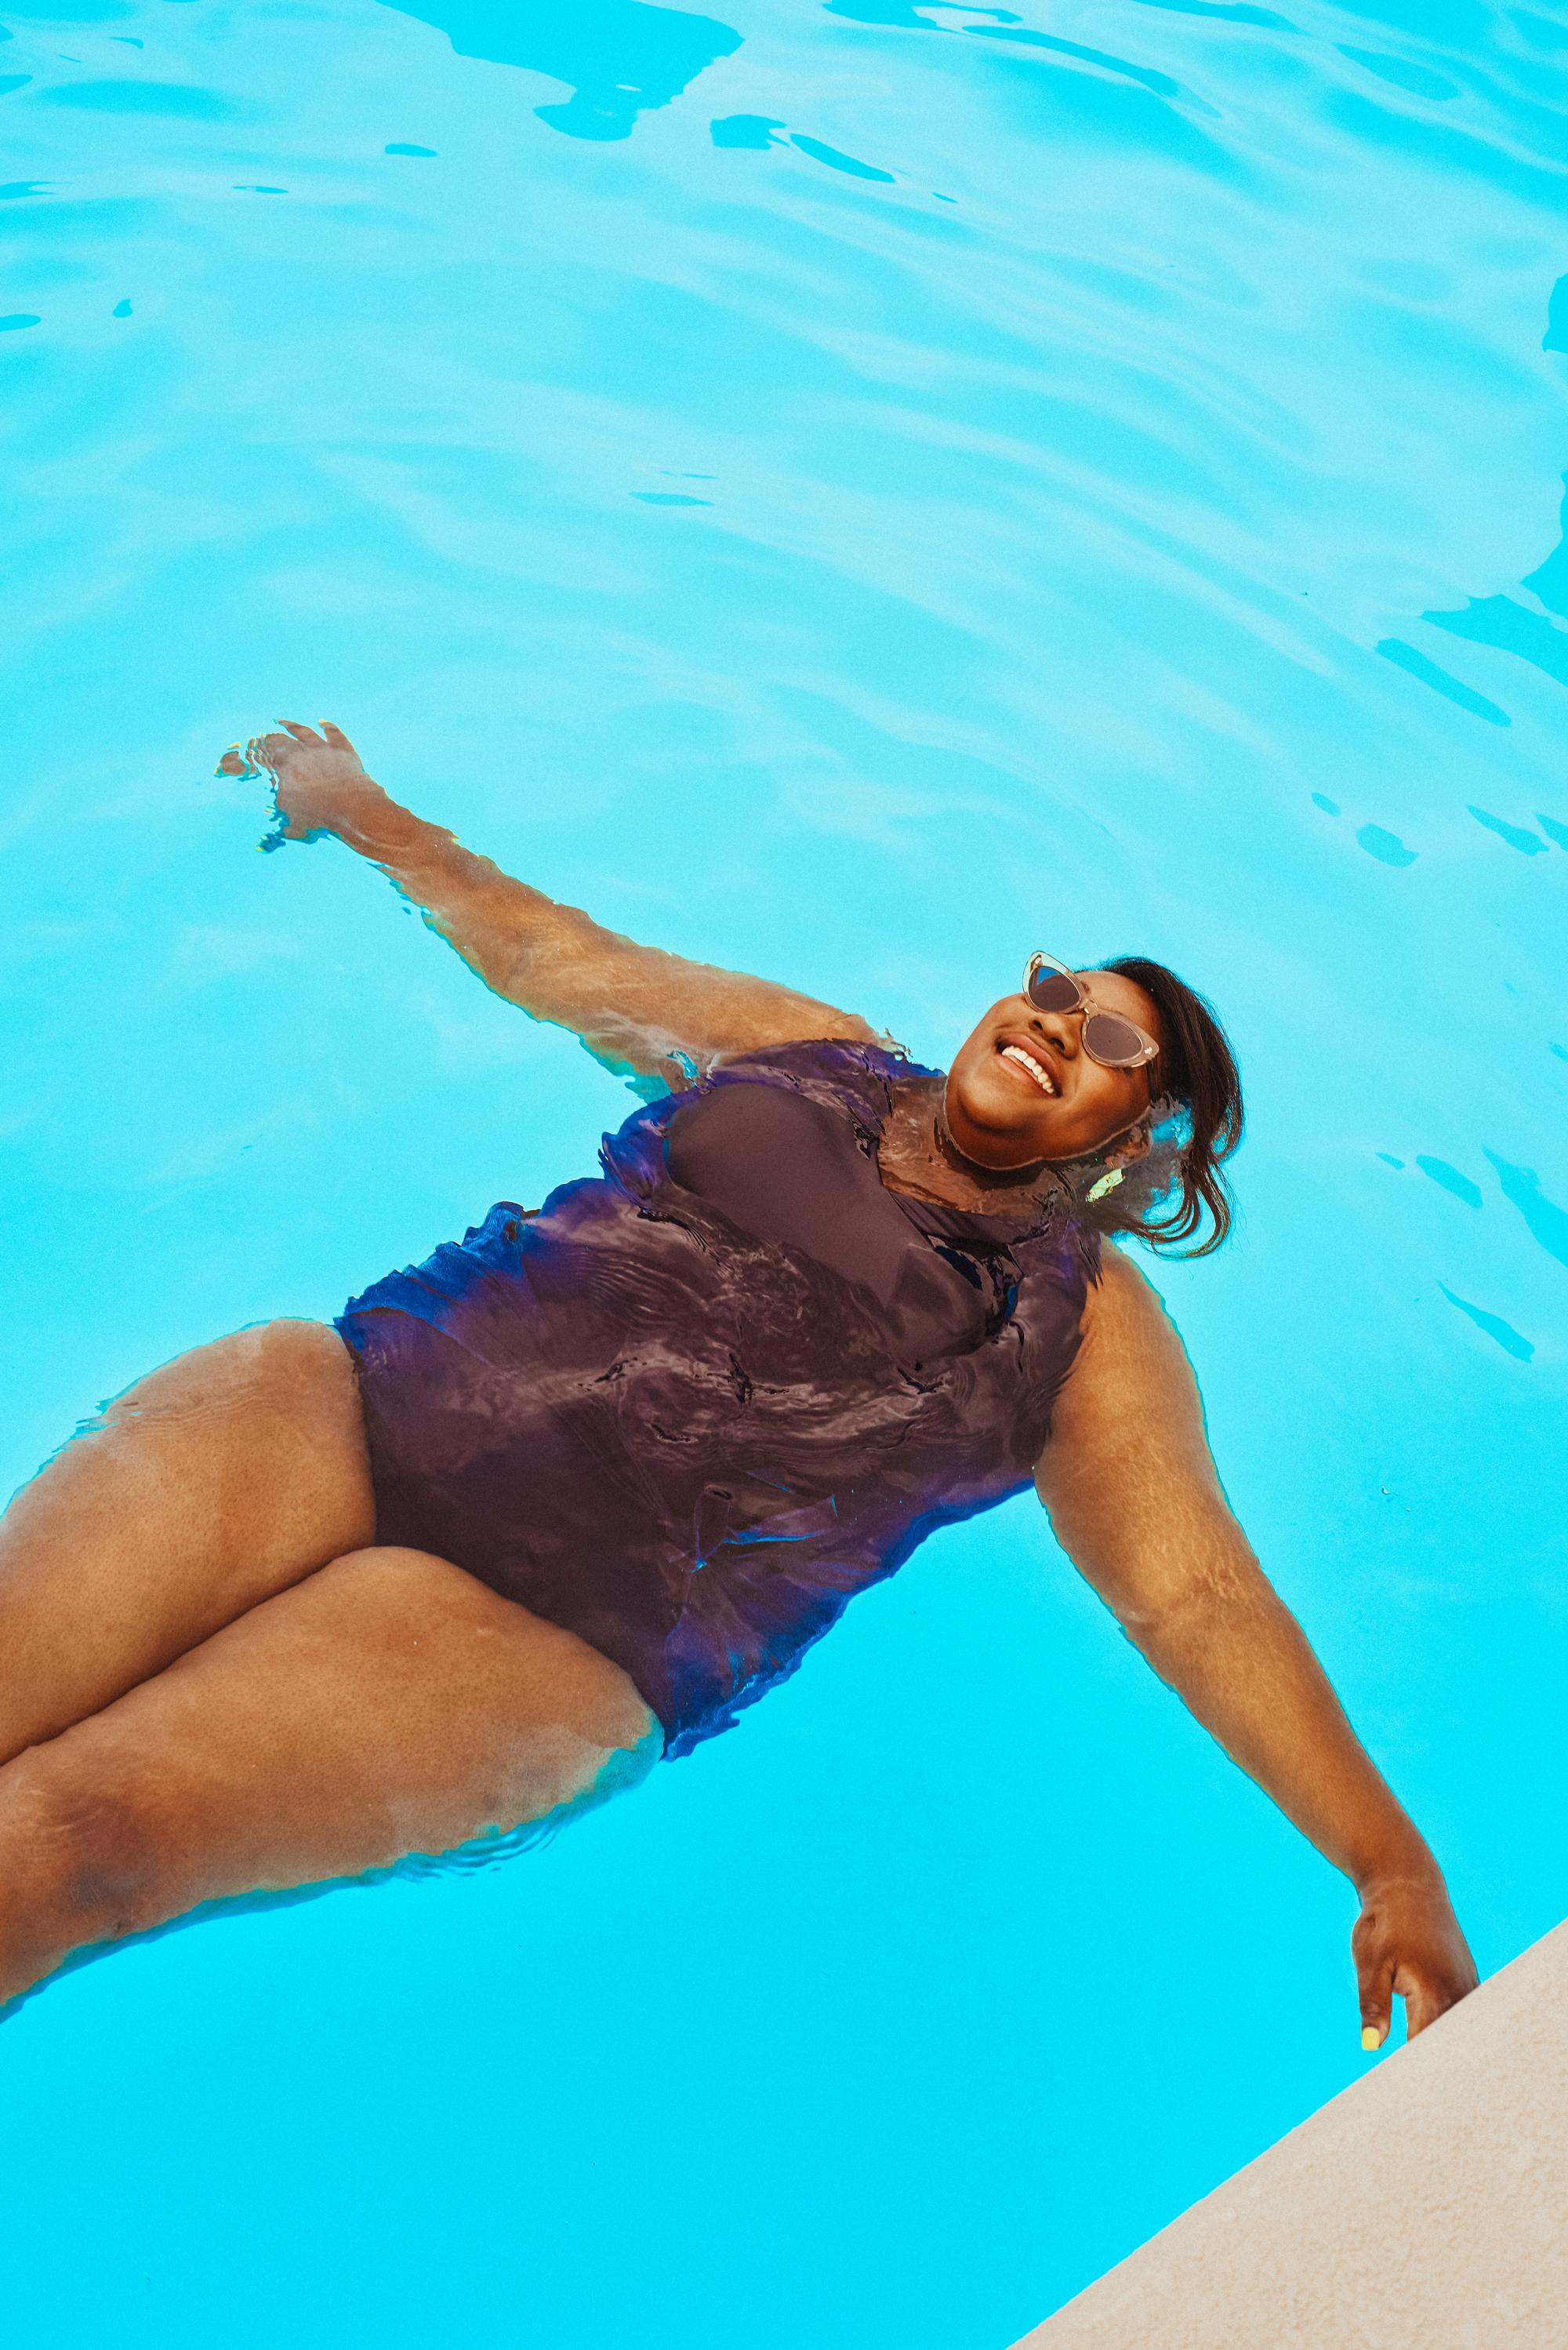 052419-bust-swim-lisa-embed.jpg